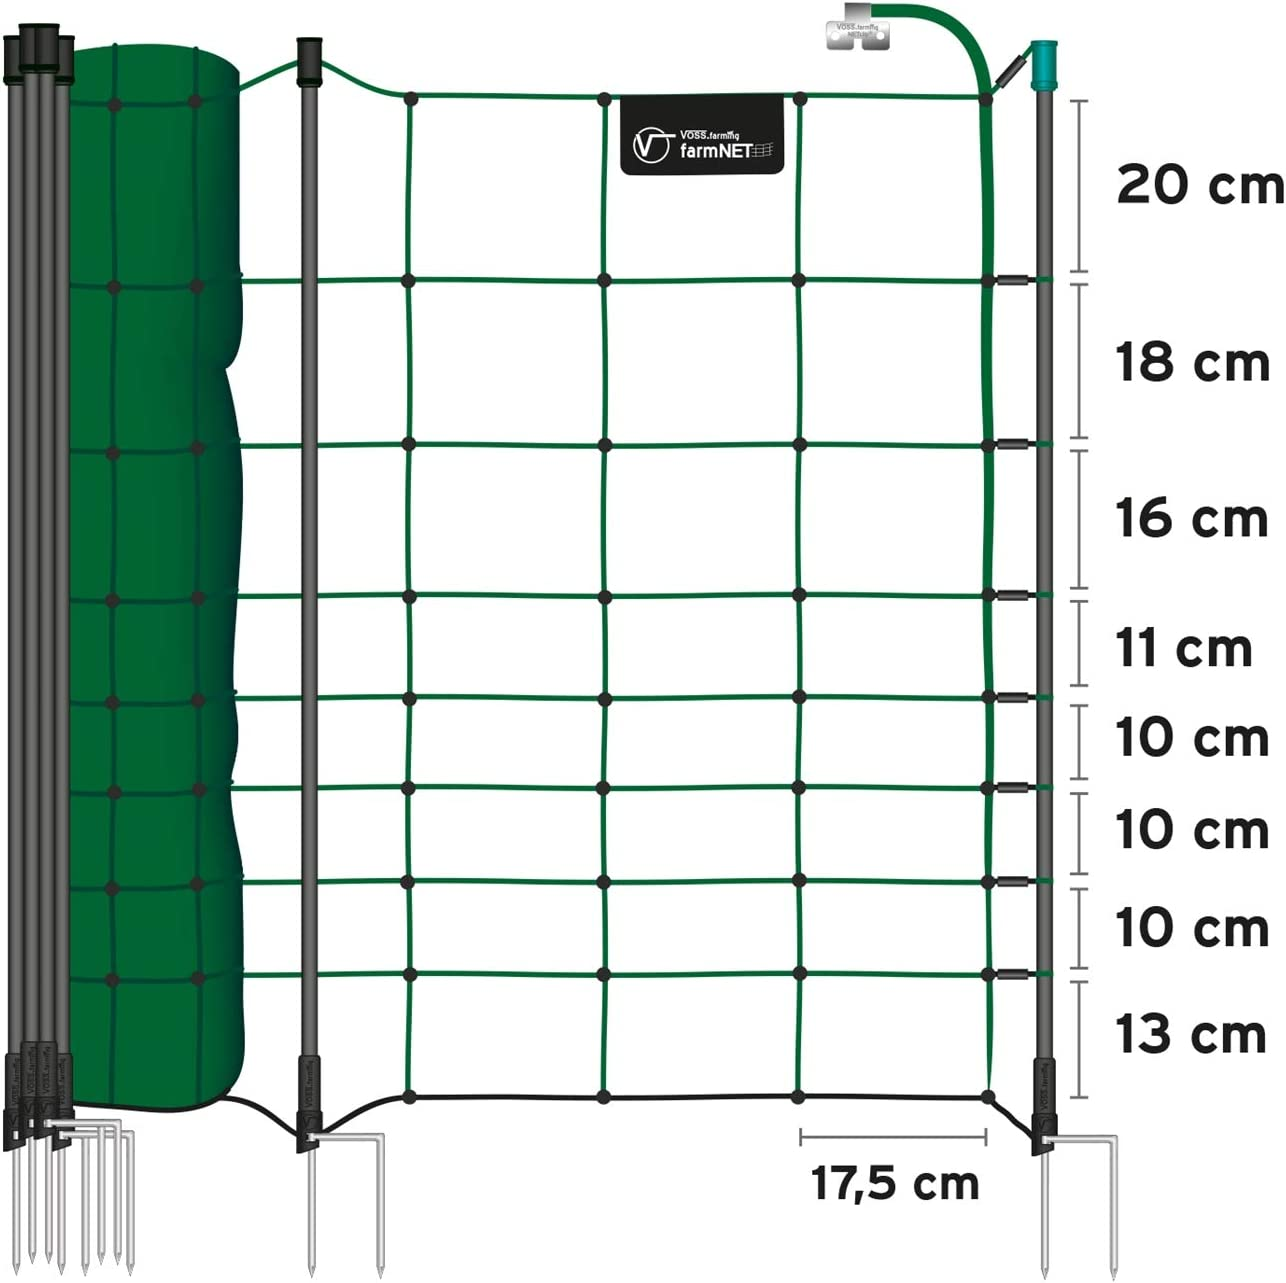 20 Pf/ähle 2 Spitzen 50m Schafnetz Ziegenzaun Elektronetz VOSS.farming Schafzaun 108cm farmNET Gr/ün